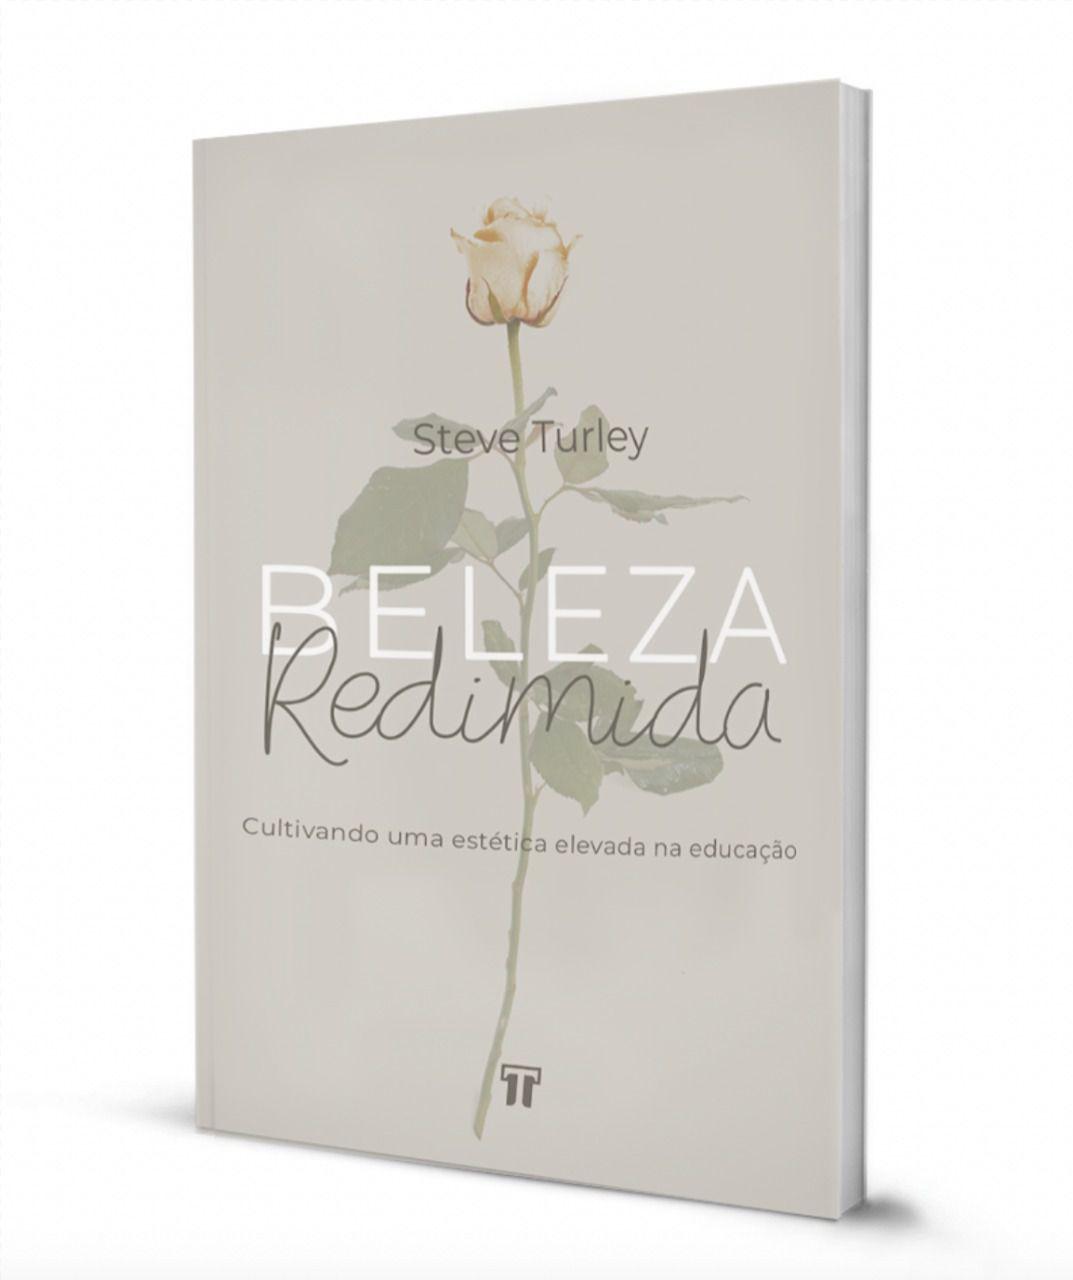 Livro Beleza redimida - Steve Turley